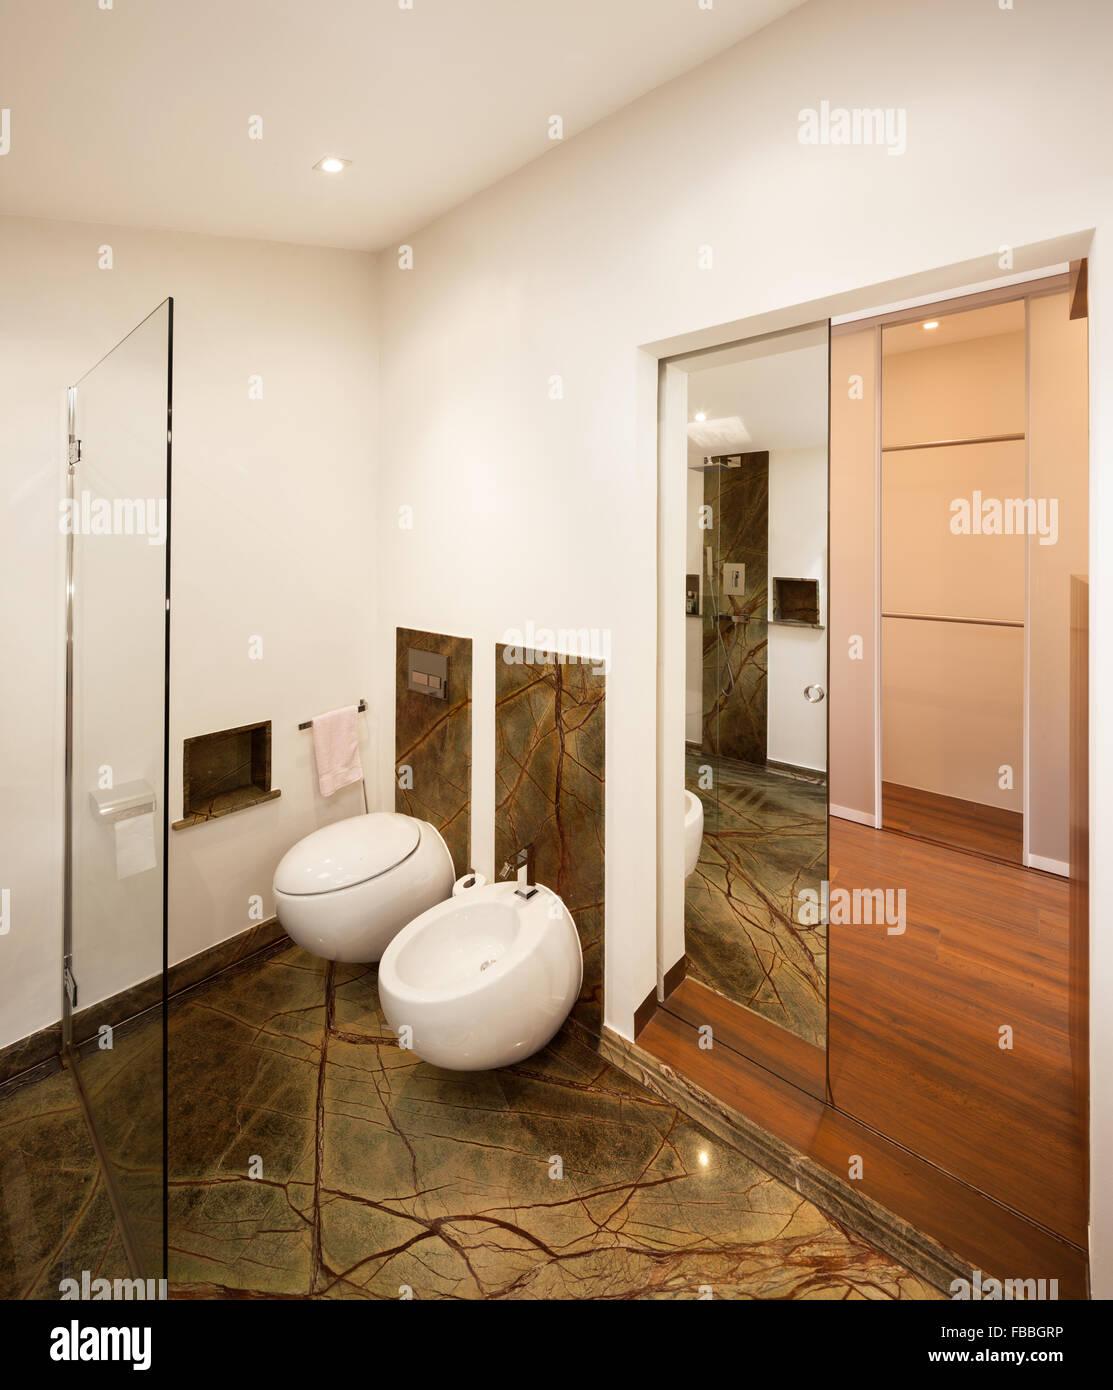 Innenarchitektur Badezimmer | Innenarchitektur Badezimmer Aus Marmor Stockfoto Bild 93067738